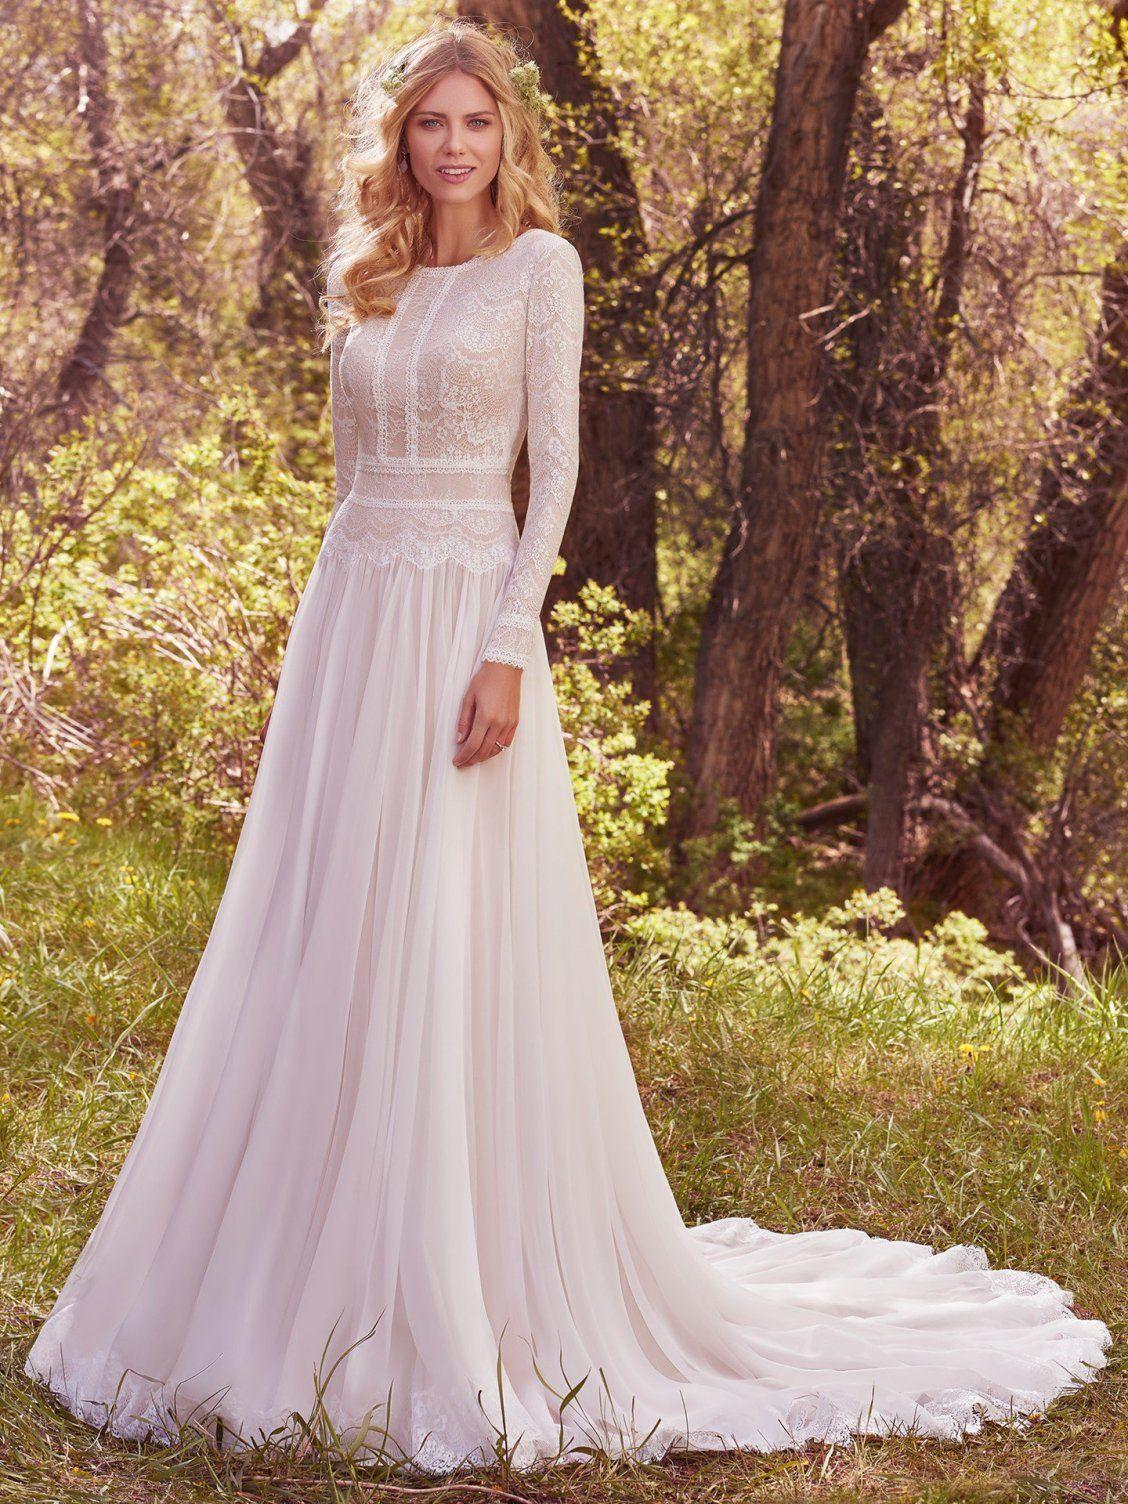 Modest long sleeve lace wedding dresses  DEIRDRE MARIE by Maggie Sottero Wedding Dresses  Modest Wedding